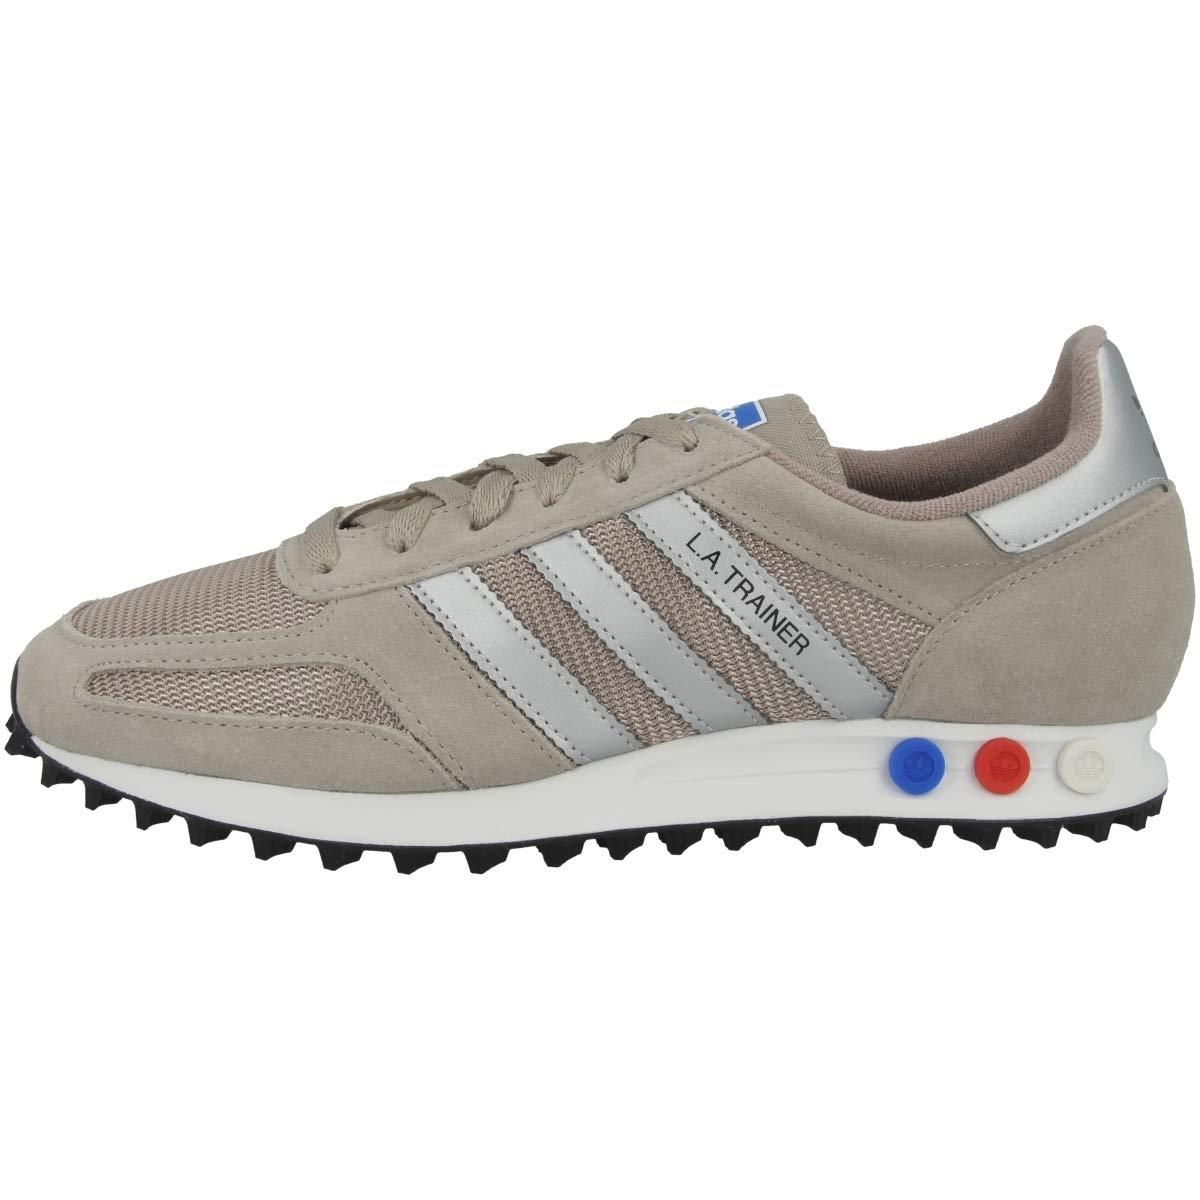 Adidas Adidas Adidas Originals B37832 Turnschuhe Man Beige 38-2 4cdcde